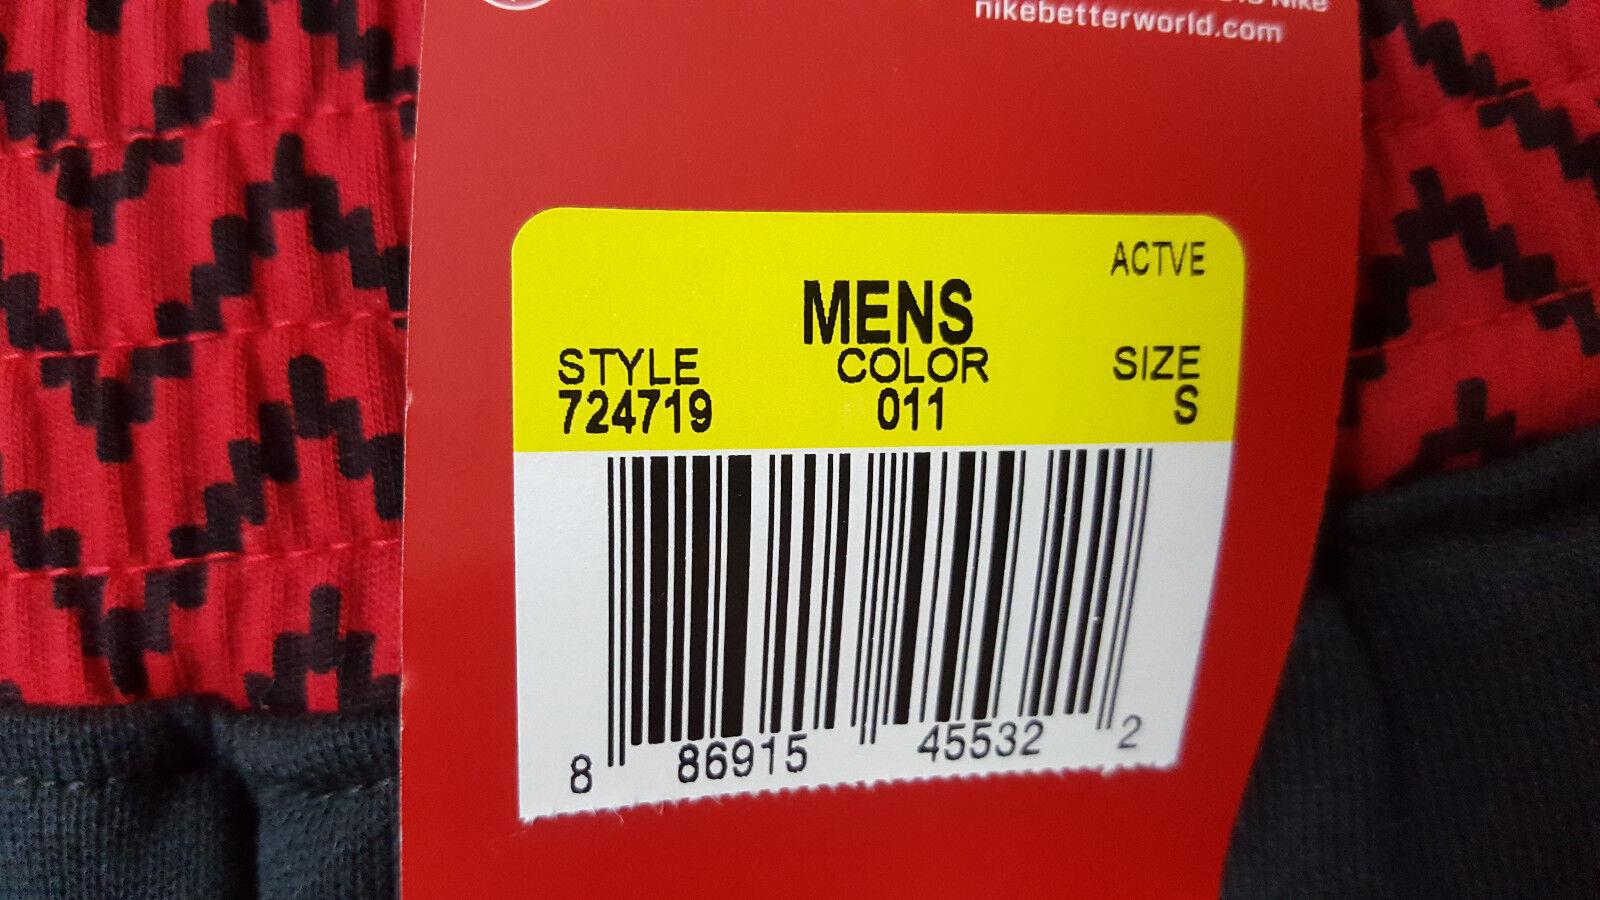 Nike jordan rosso xii 12 completo camicia + pantaloncini bianco rosso jordan rari (dimensioni piccole) ac8052